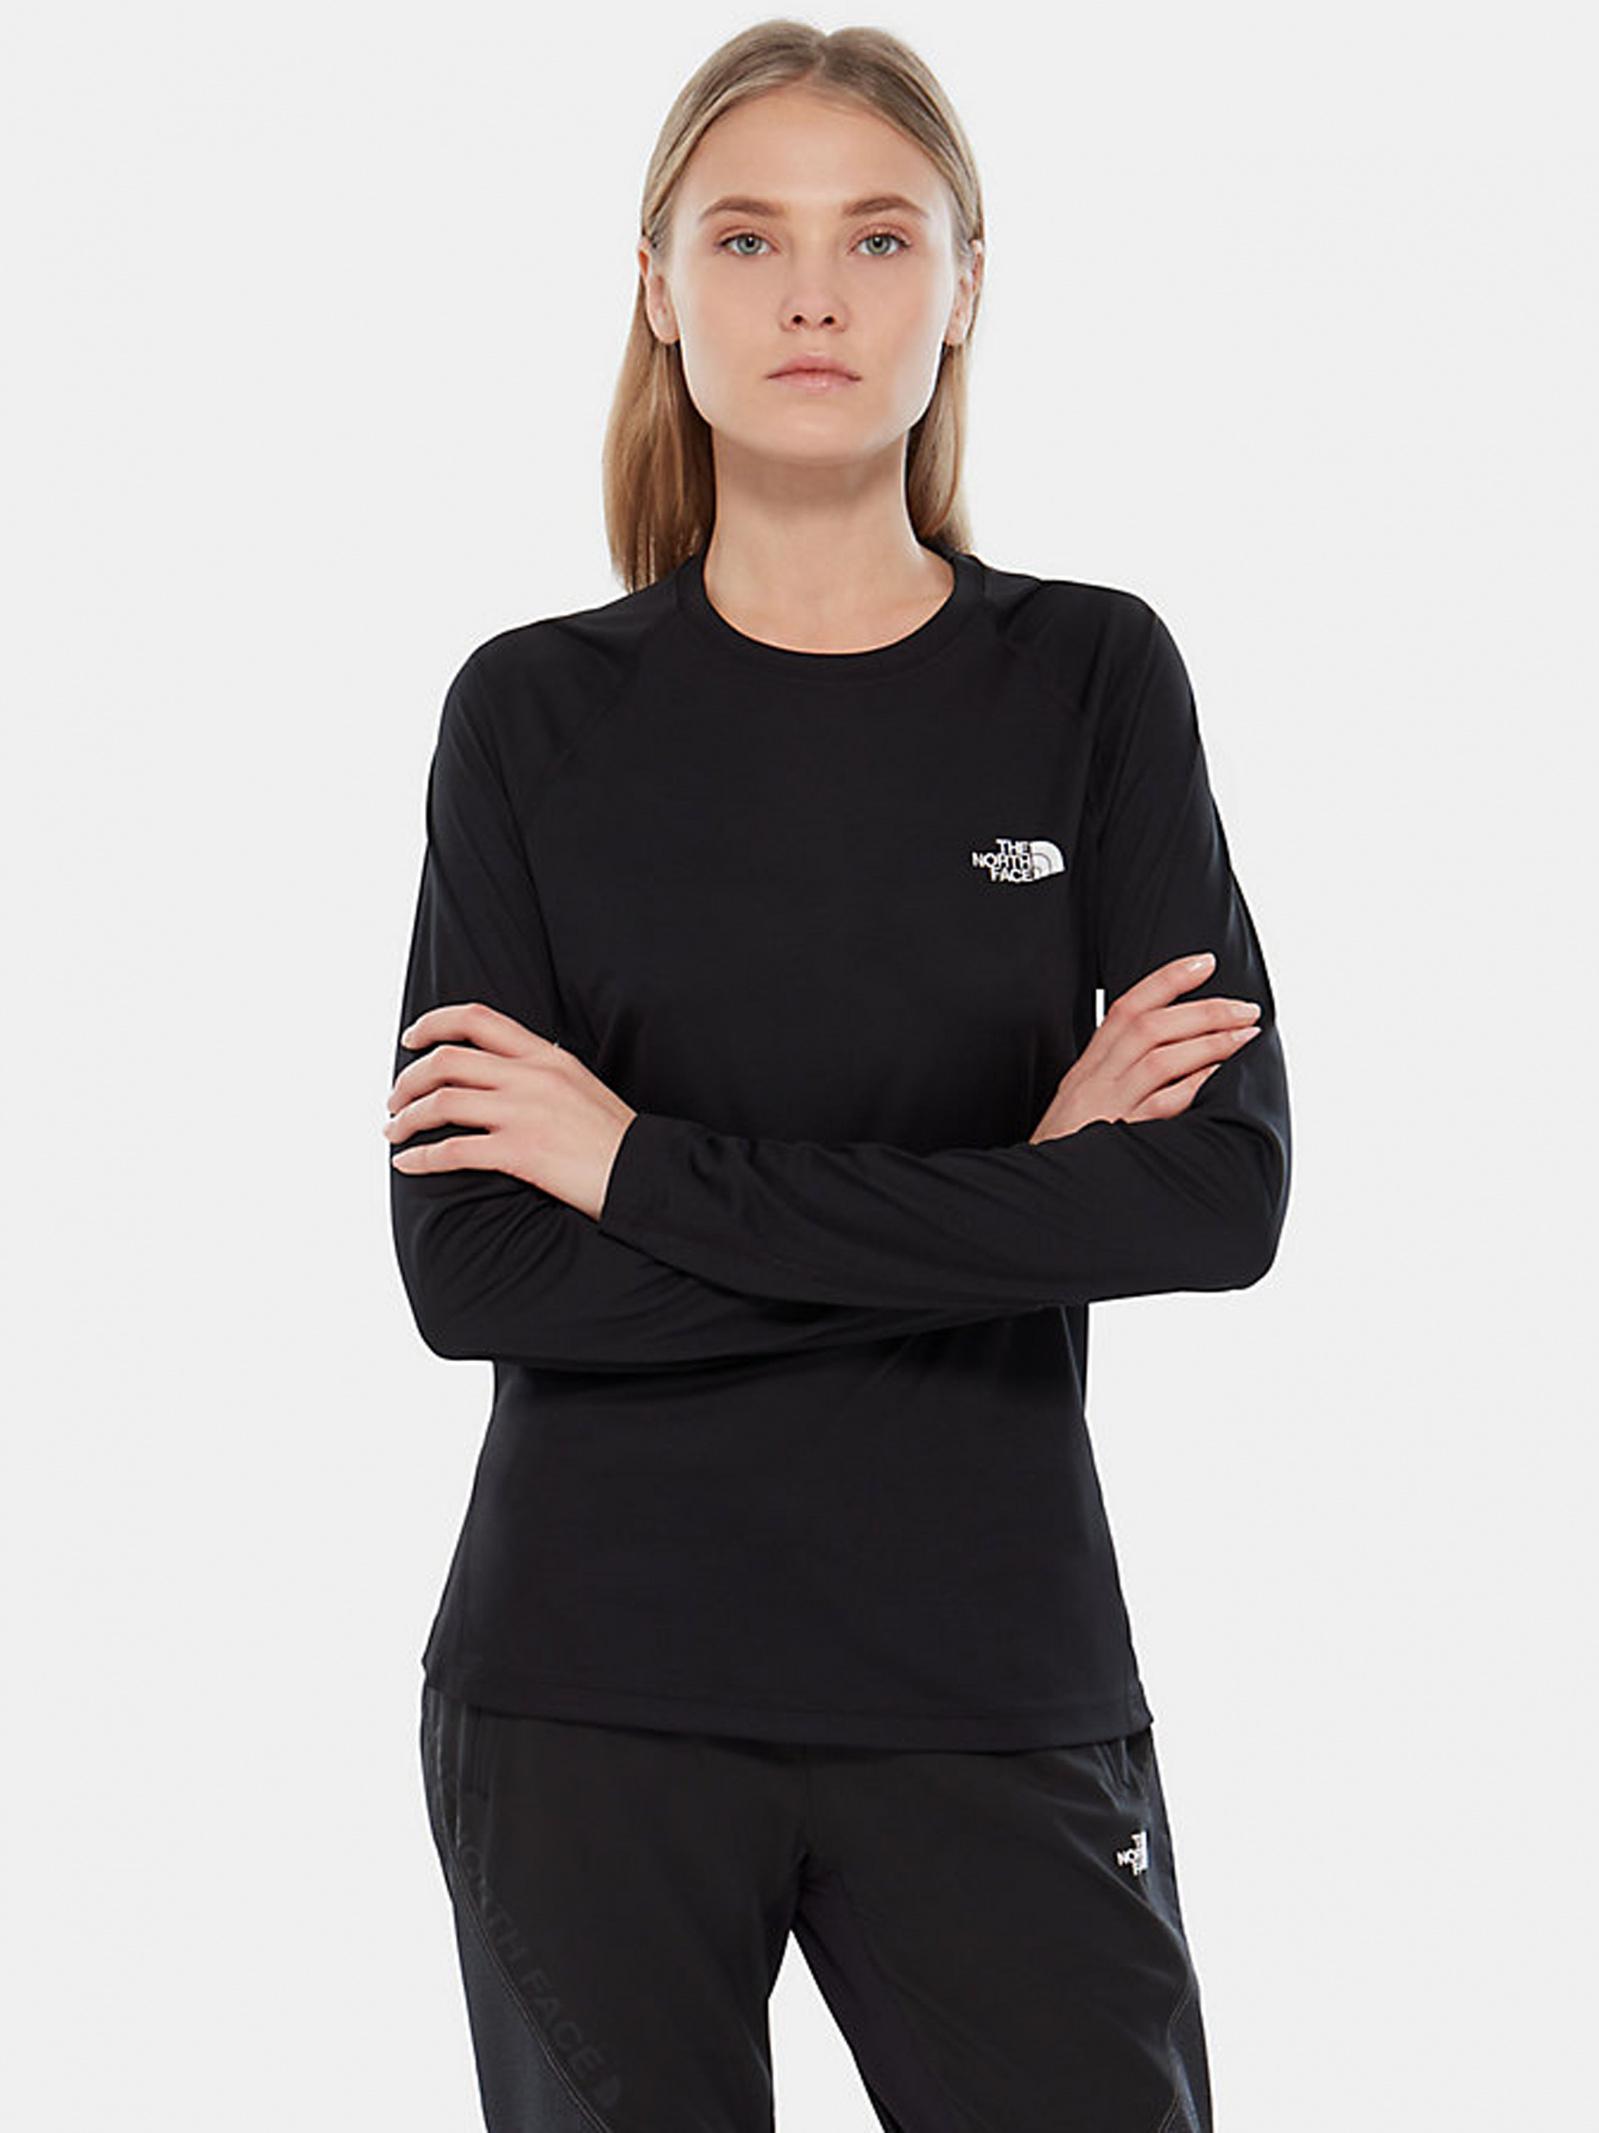 Кофты и свитера женские The North Face модель NF0A3UWMJK31 цена, 2017